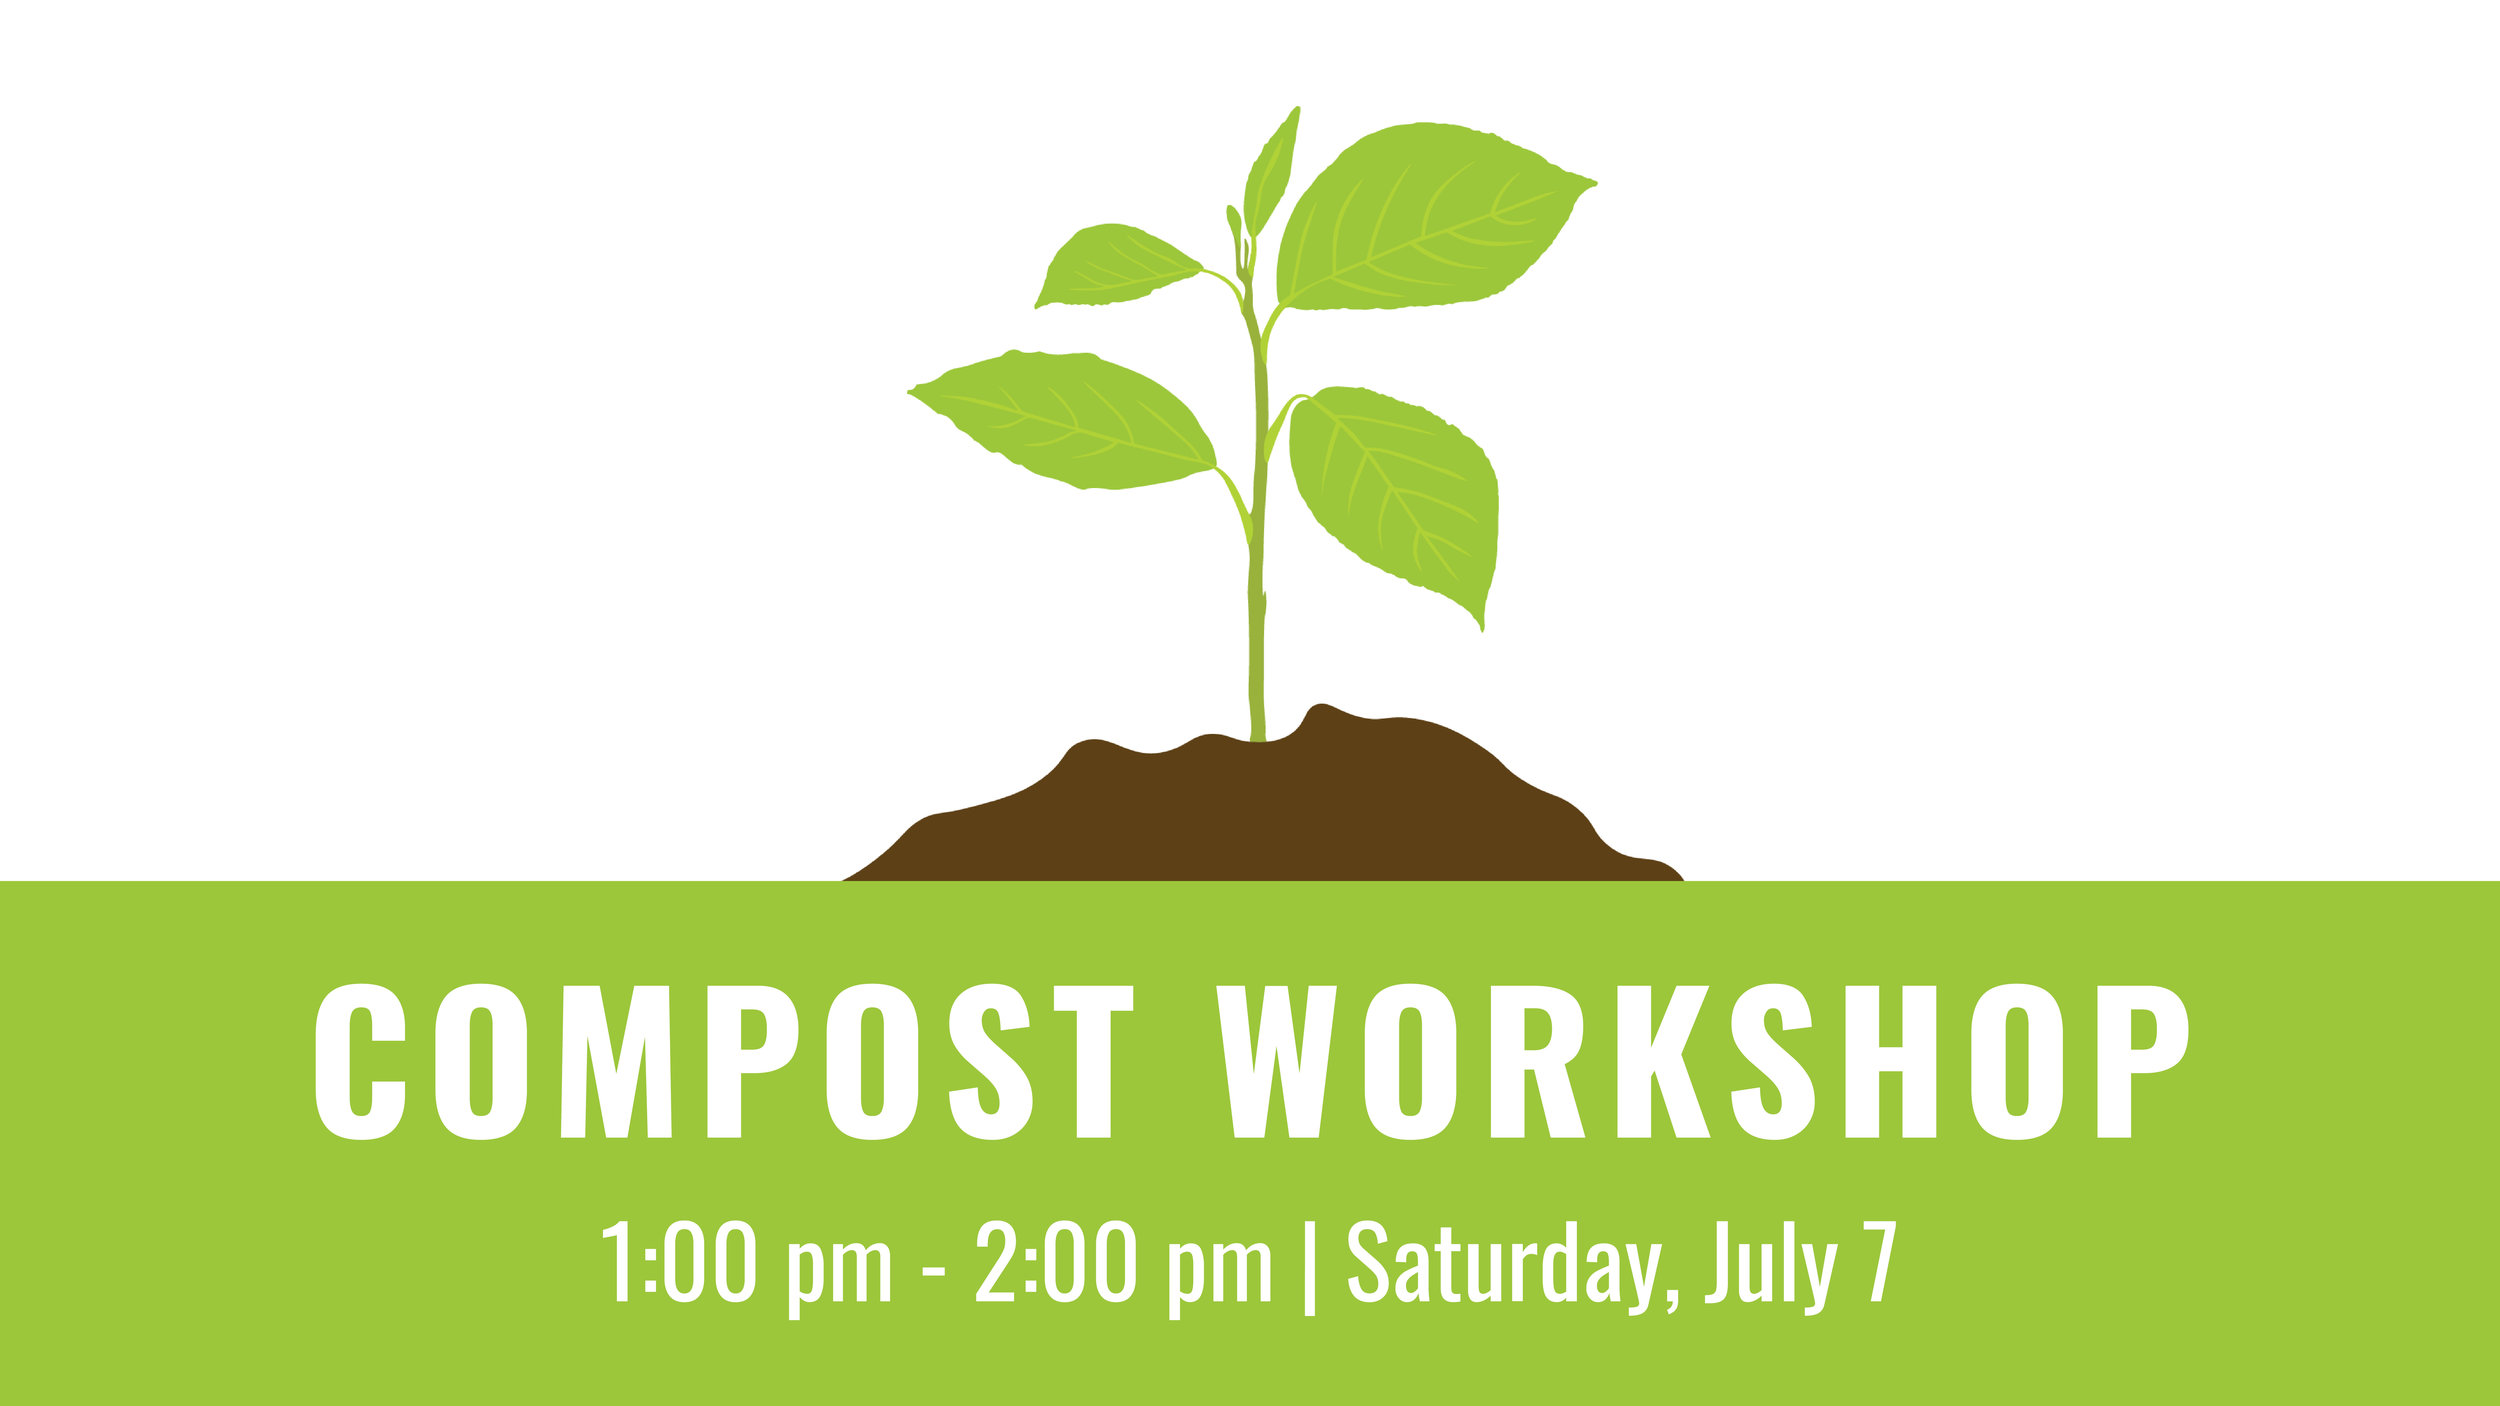 180630 Compost FB Event Image_revised.jpg